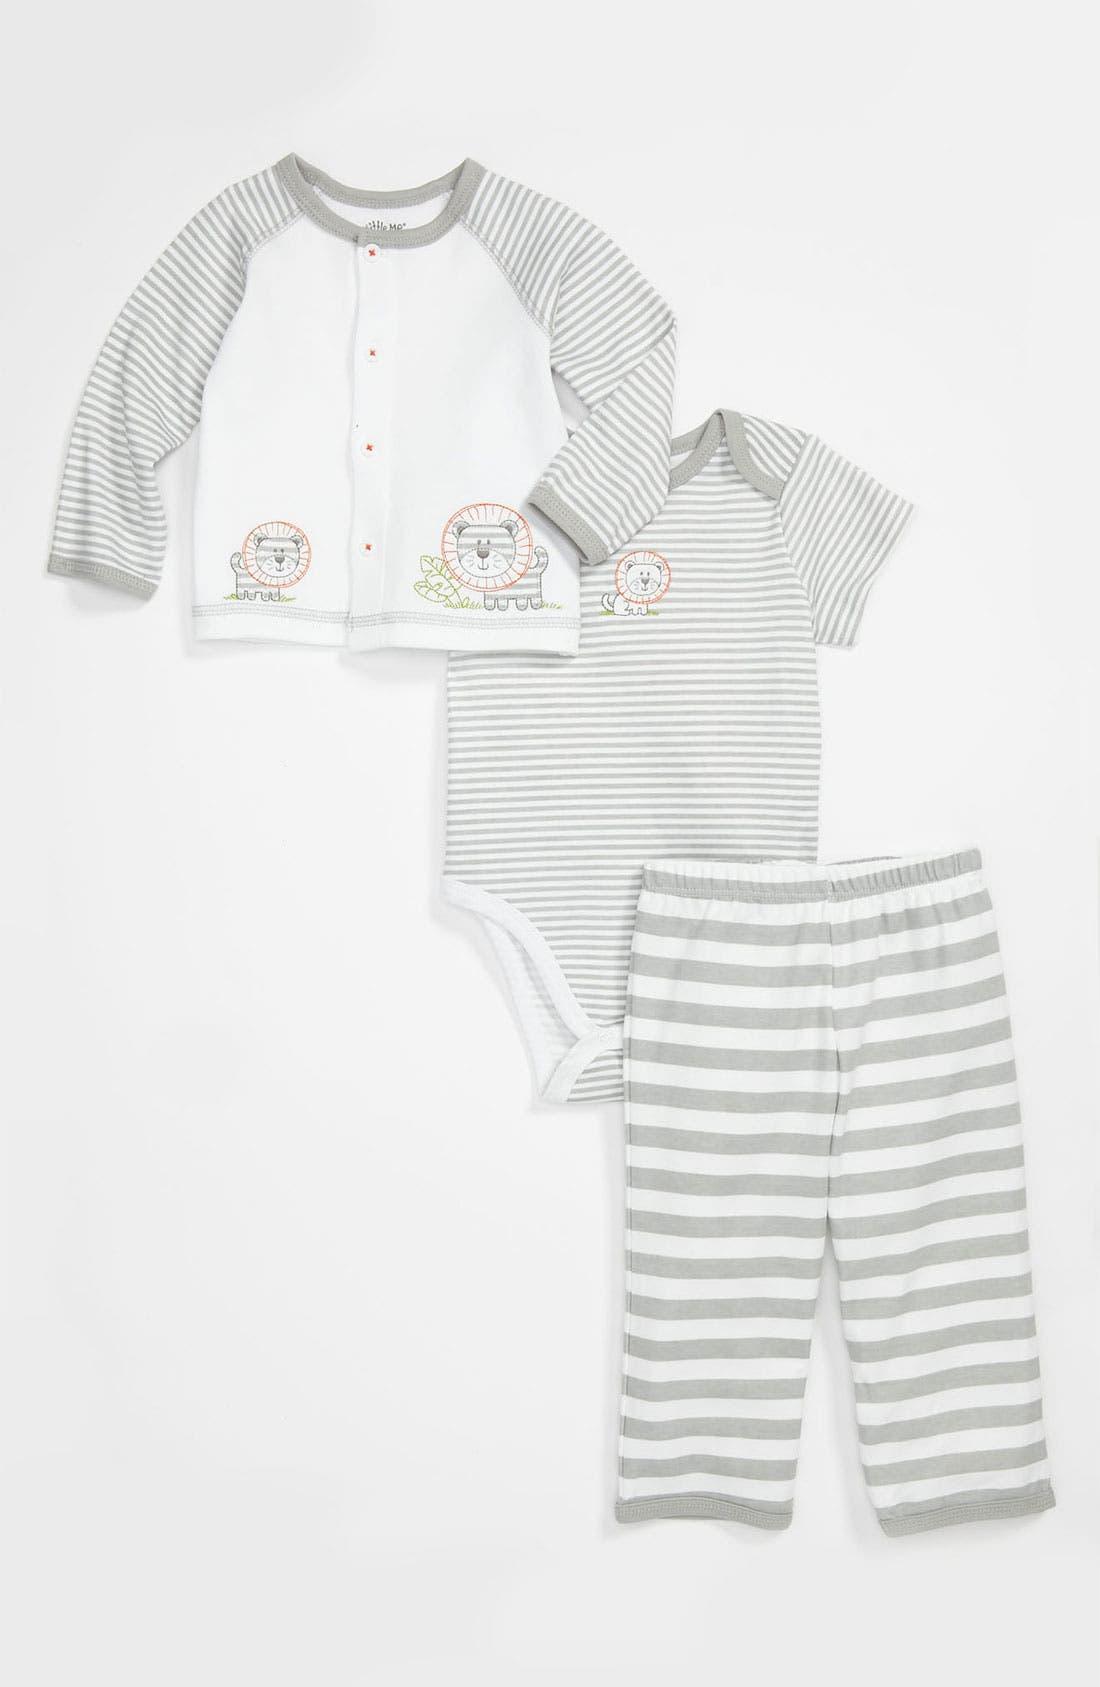 Main Image - Little Me 'Take Me Home - Lion' Bodysuit, Cardigan & Leggings (Infant)